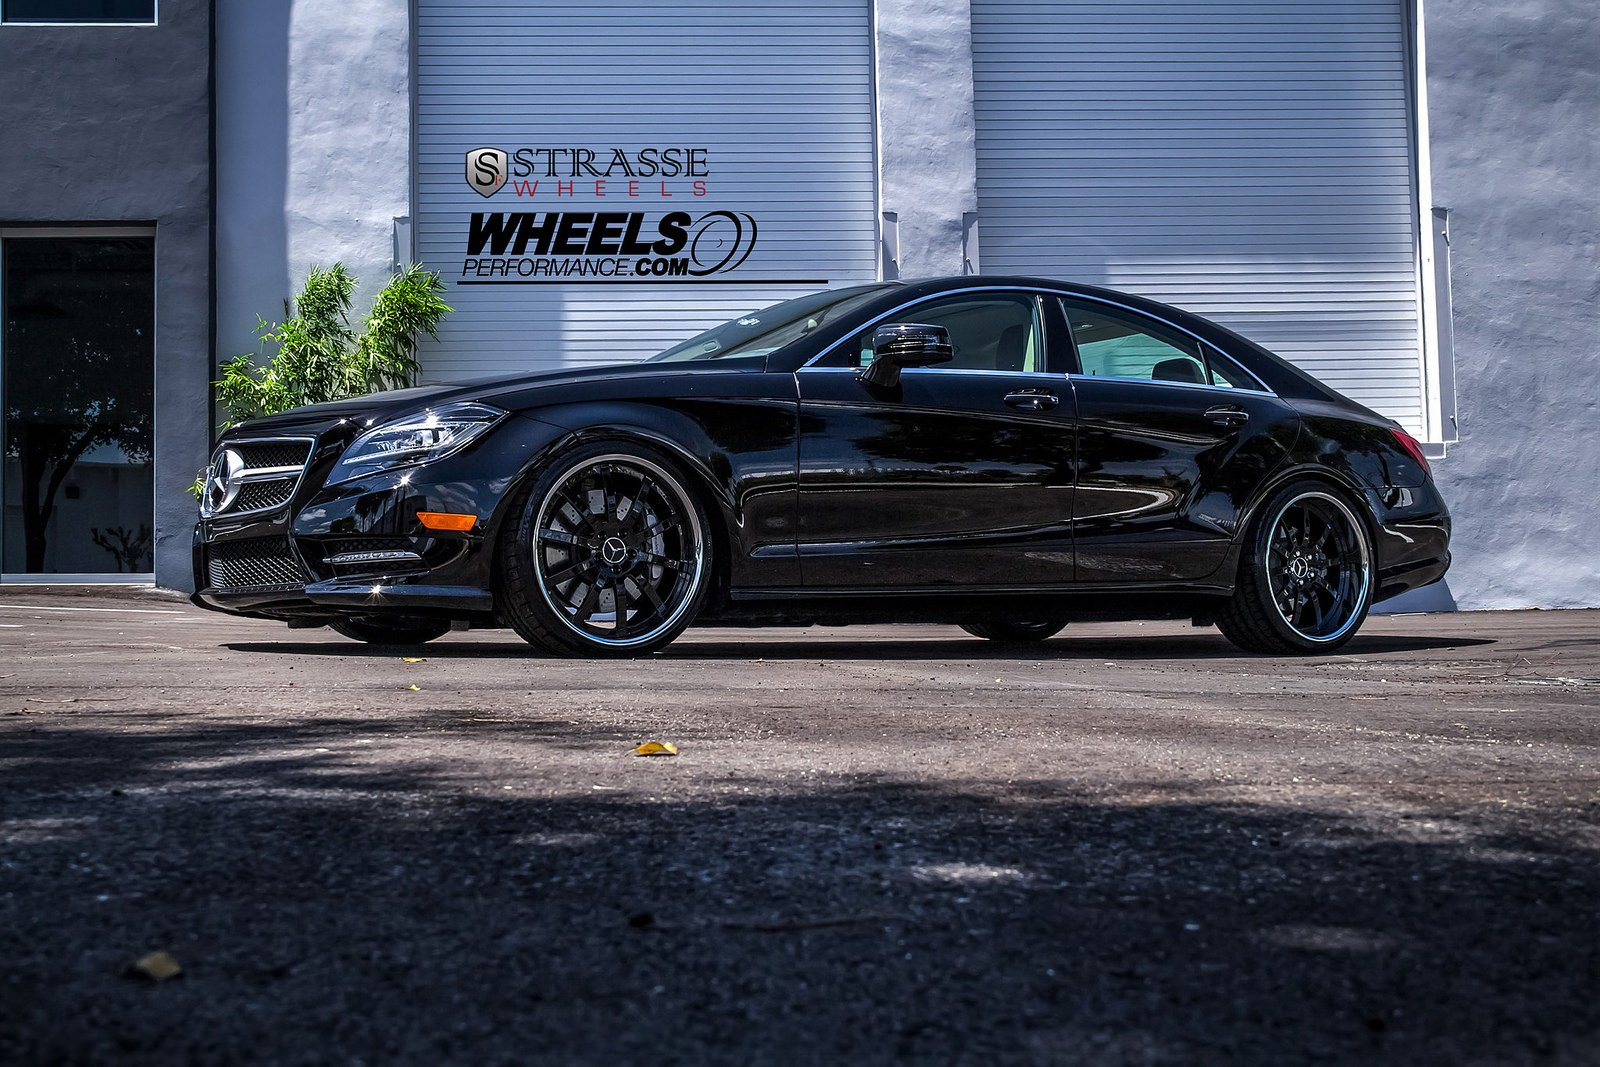 Mercedes CLS550 Strasse Wheels tuning cars black wallpaper ...